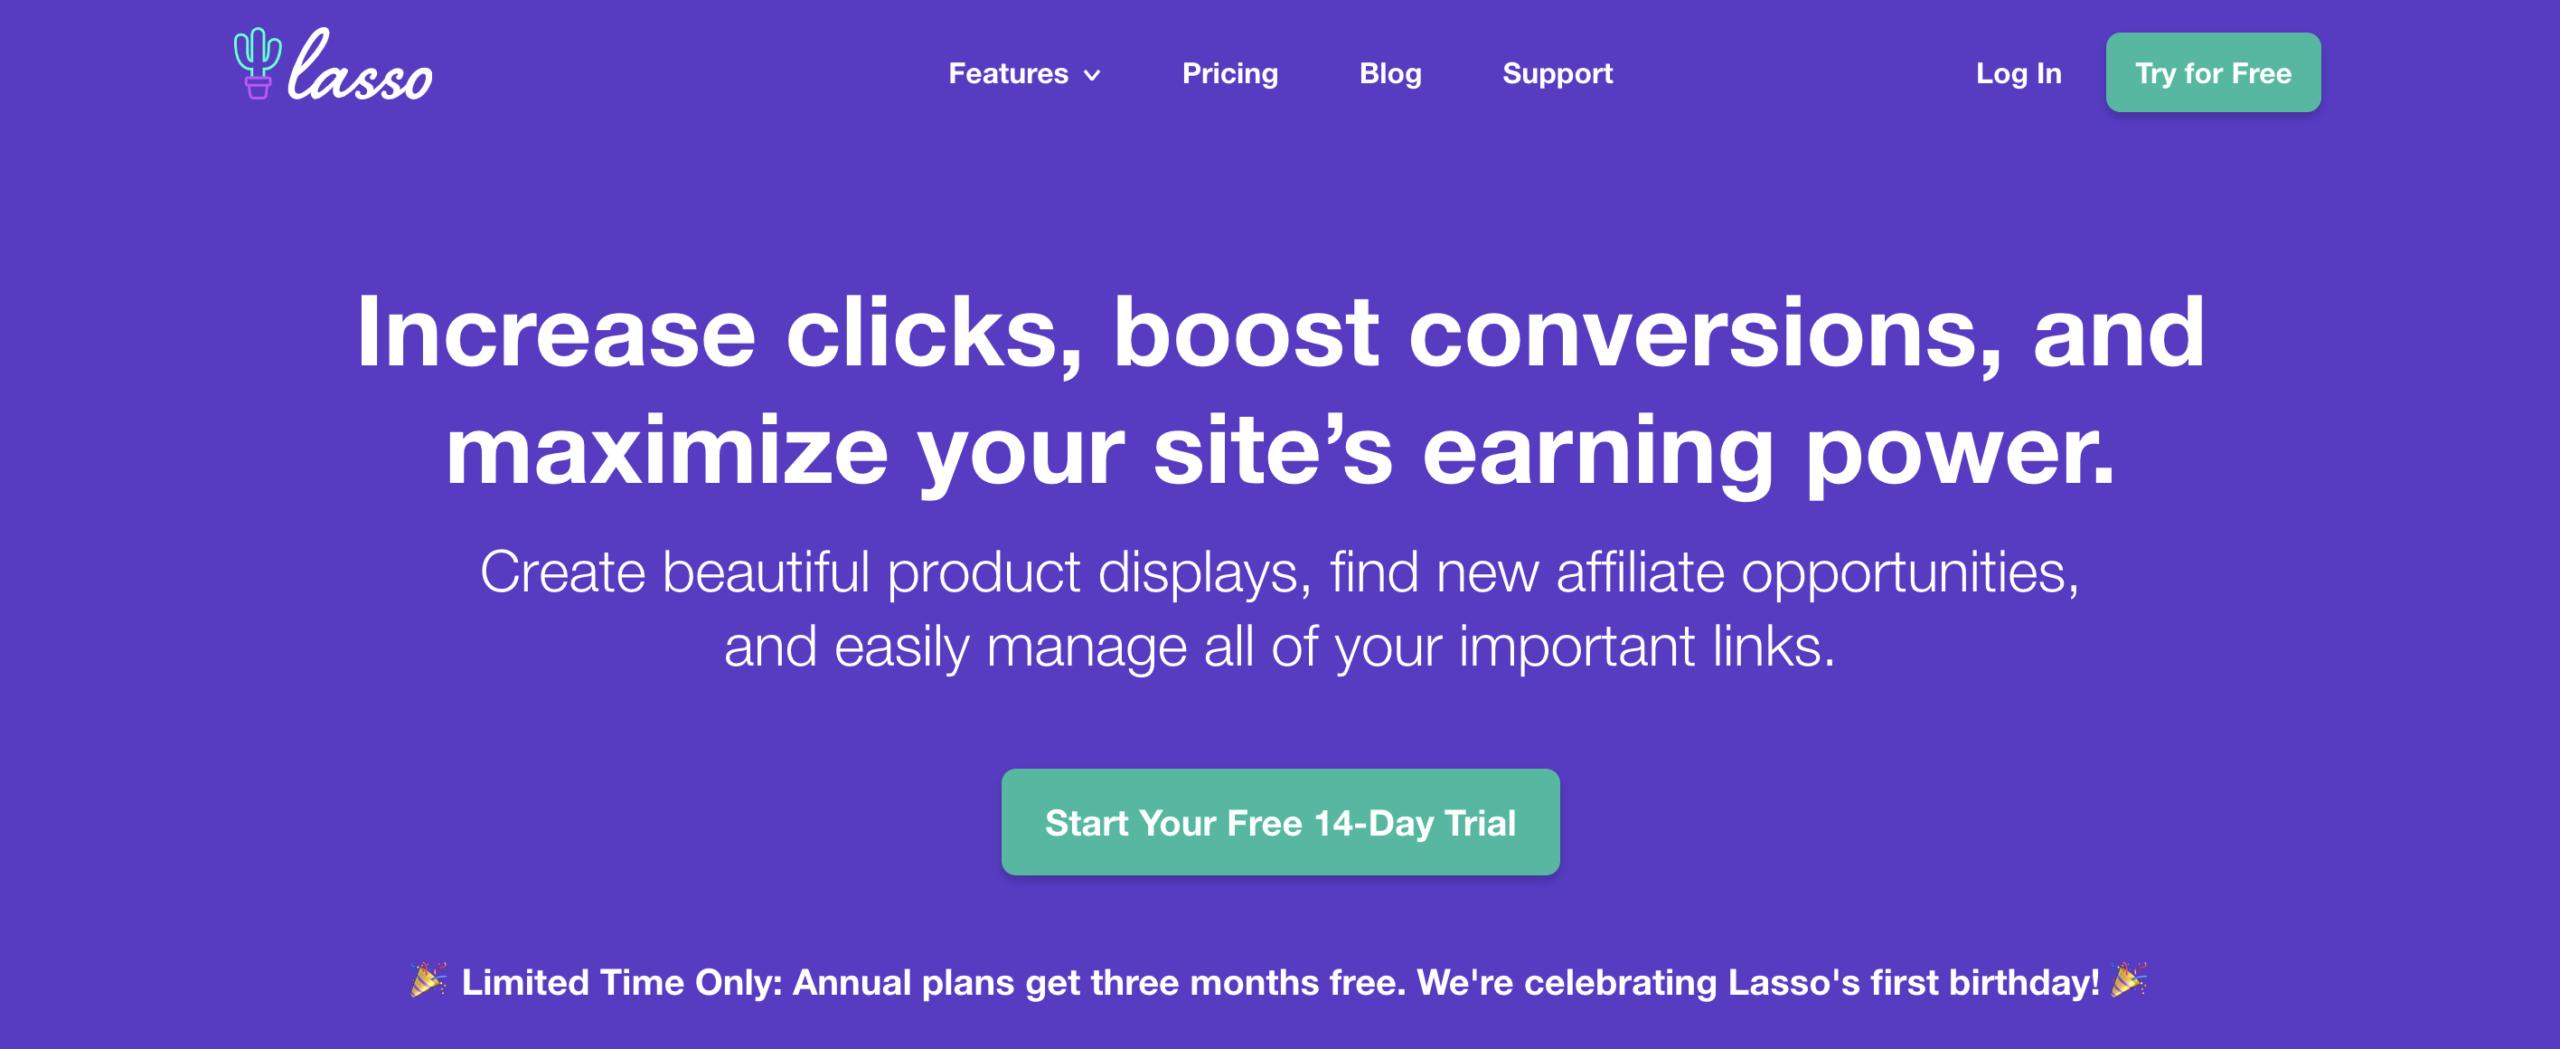 lasso homepage